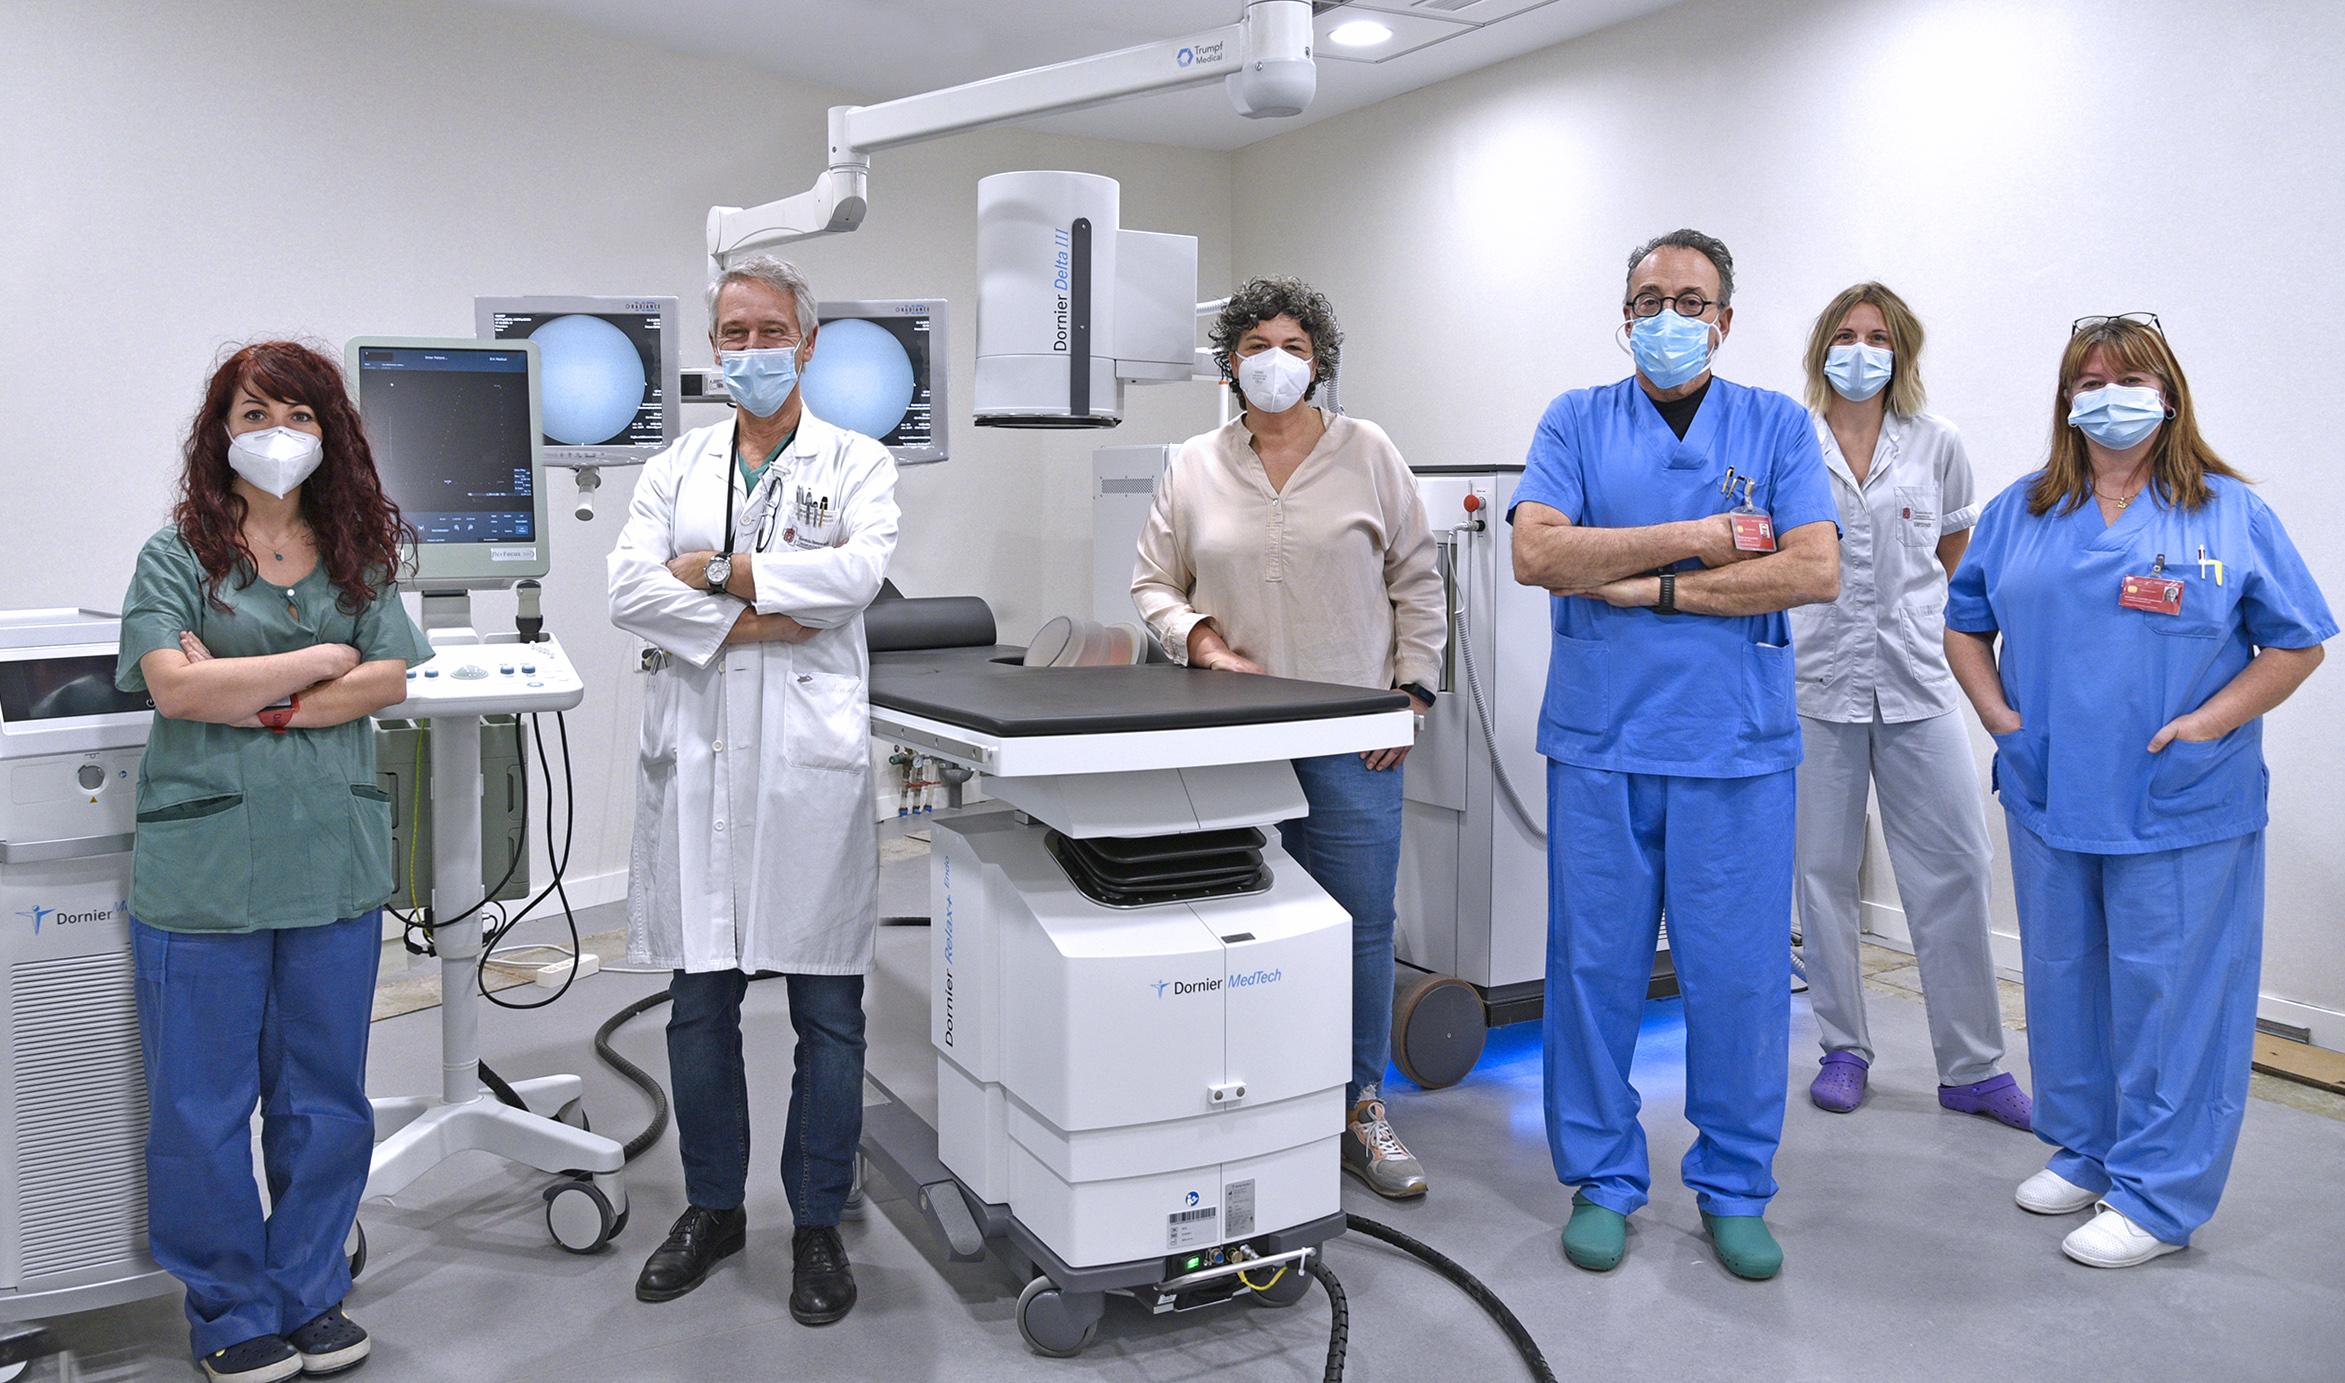 De izda. a dcha.: Zaloa Amelibia (facultativa adjuntade Urología), Manuel Montesino (jefe de servicio), Pili Luri (enfermera), Andrés Rivas (jefe de la Sección de Urología), Aitziber Allo (enfermera) y Araceli Cortés (auxiliar de enfermería).